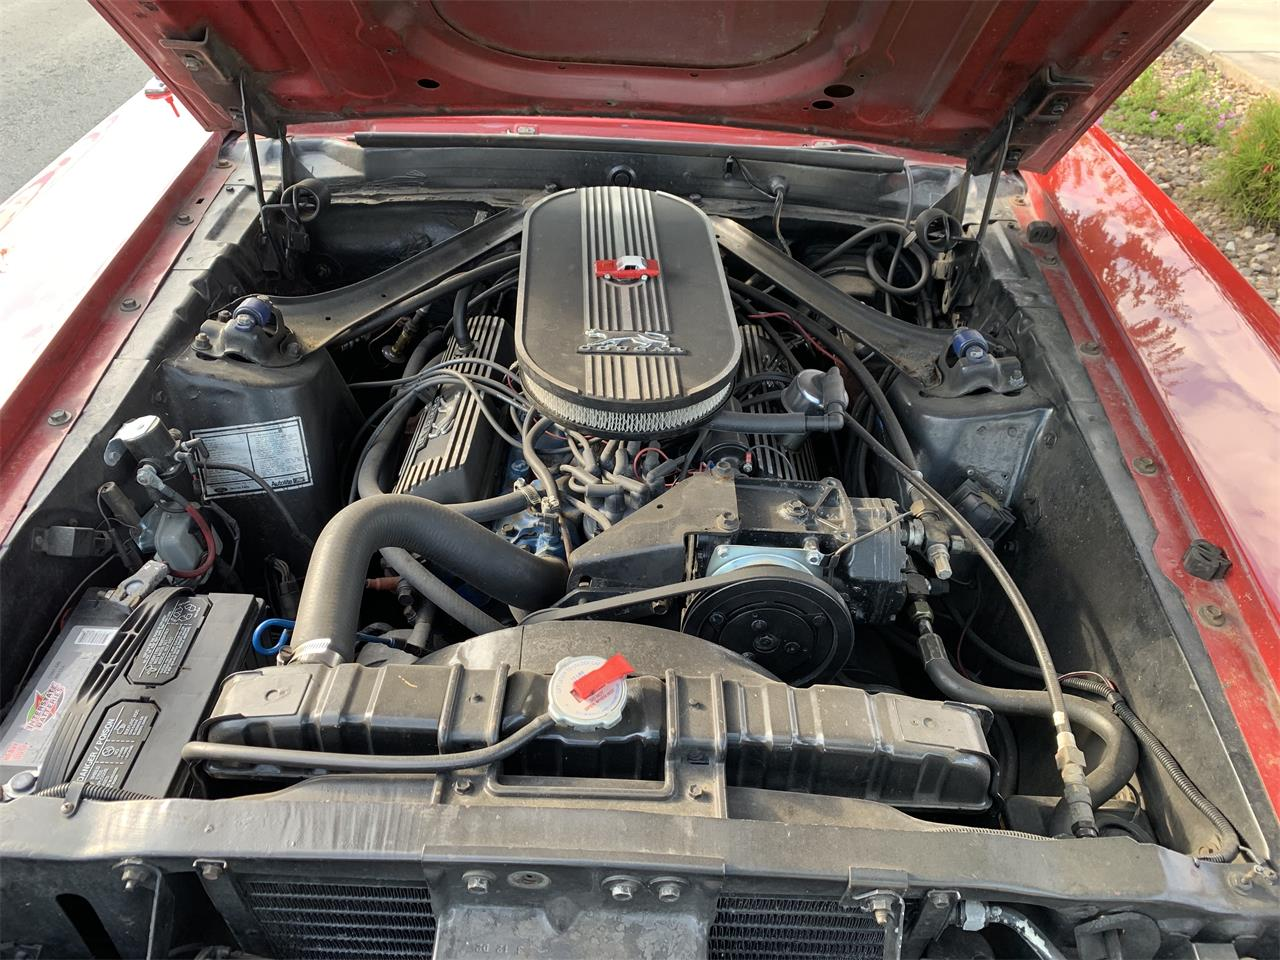 1969 Mercury Cougar (CC-1414759) for sale in Queen Creek, Arizona